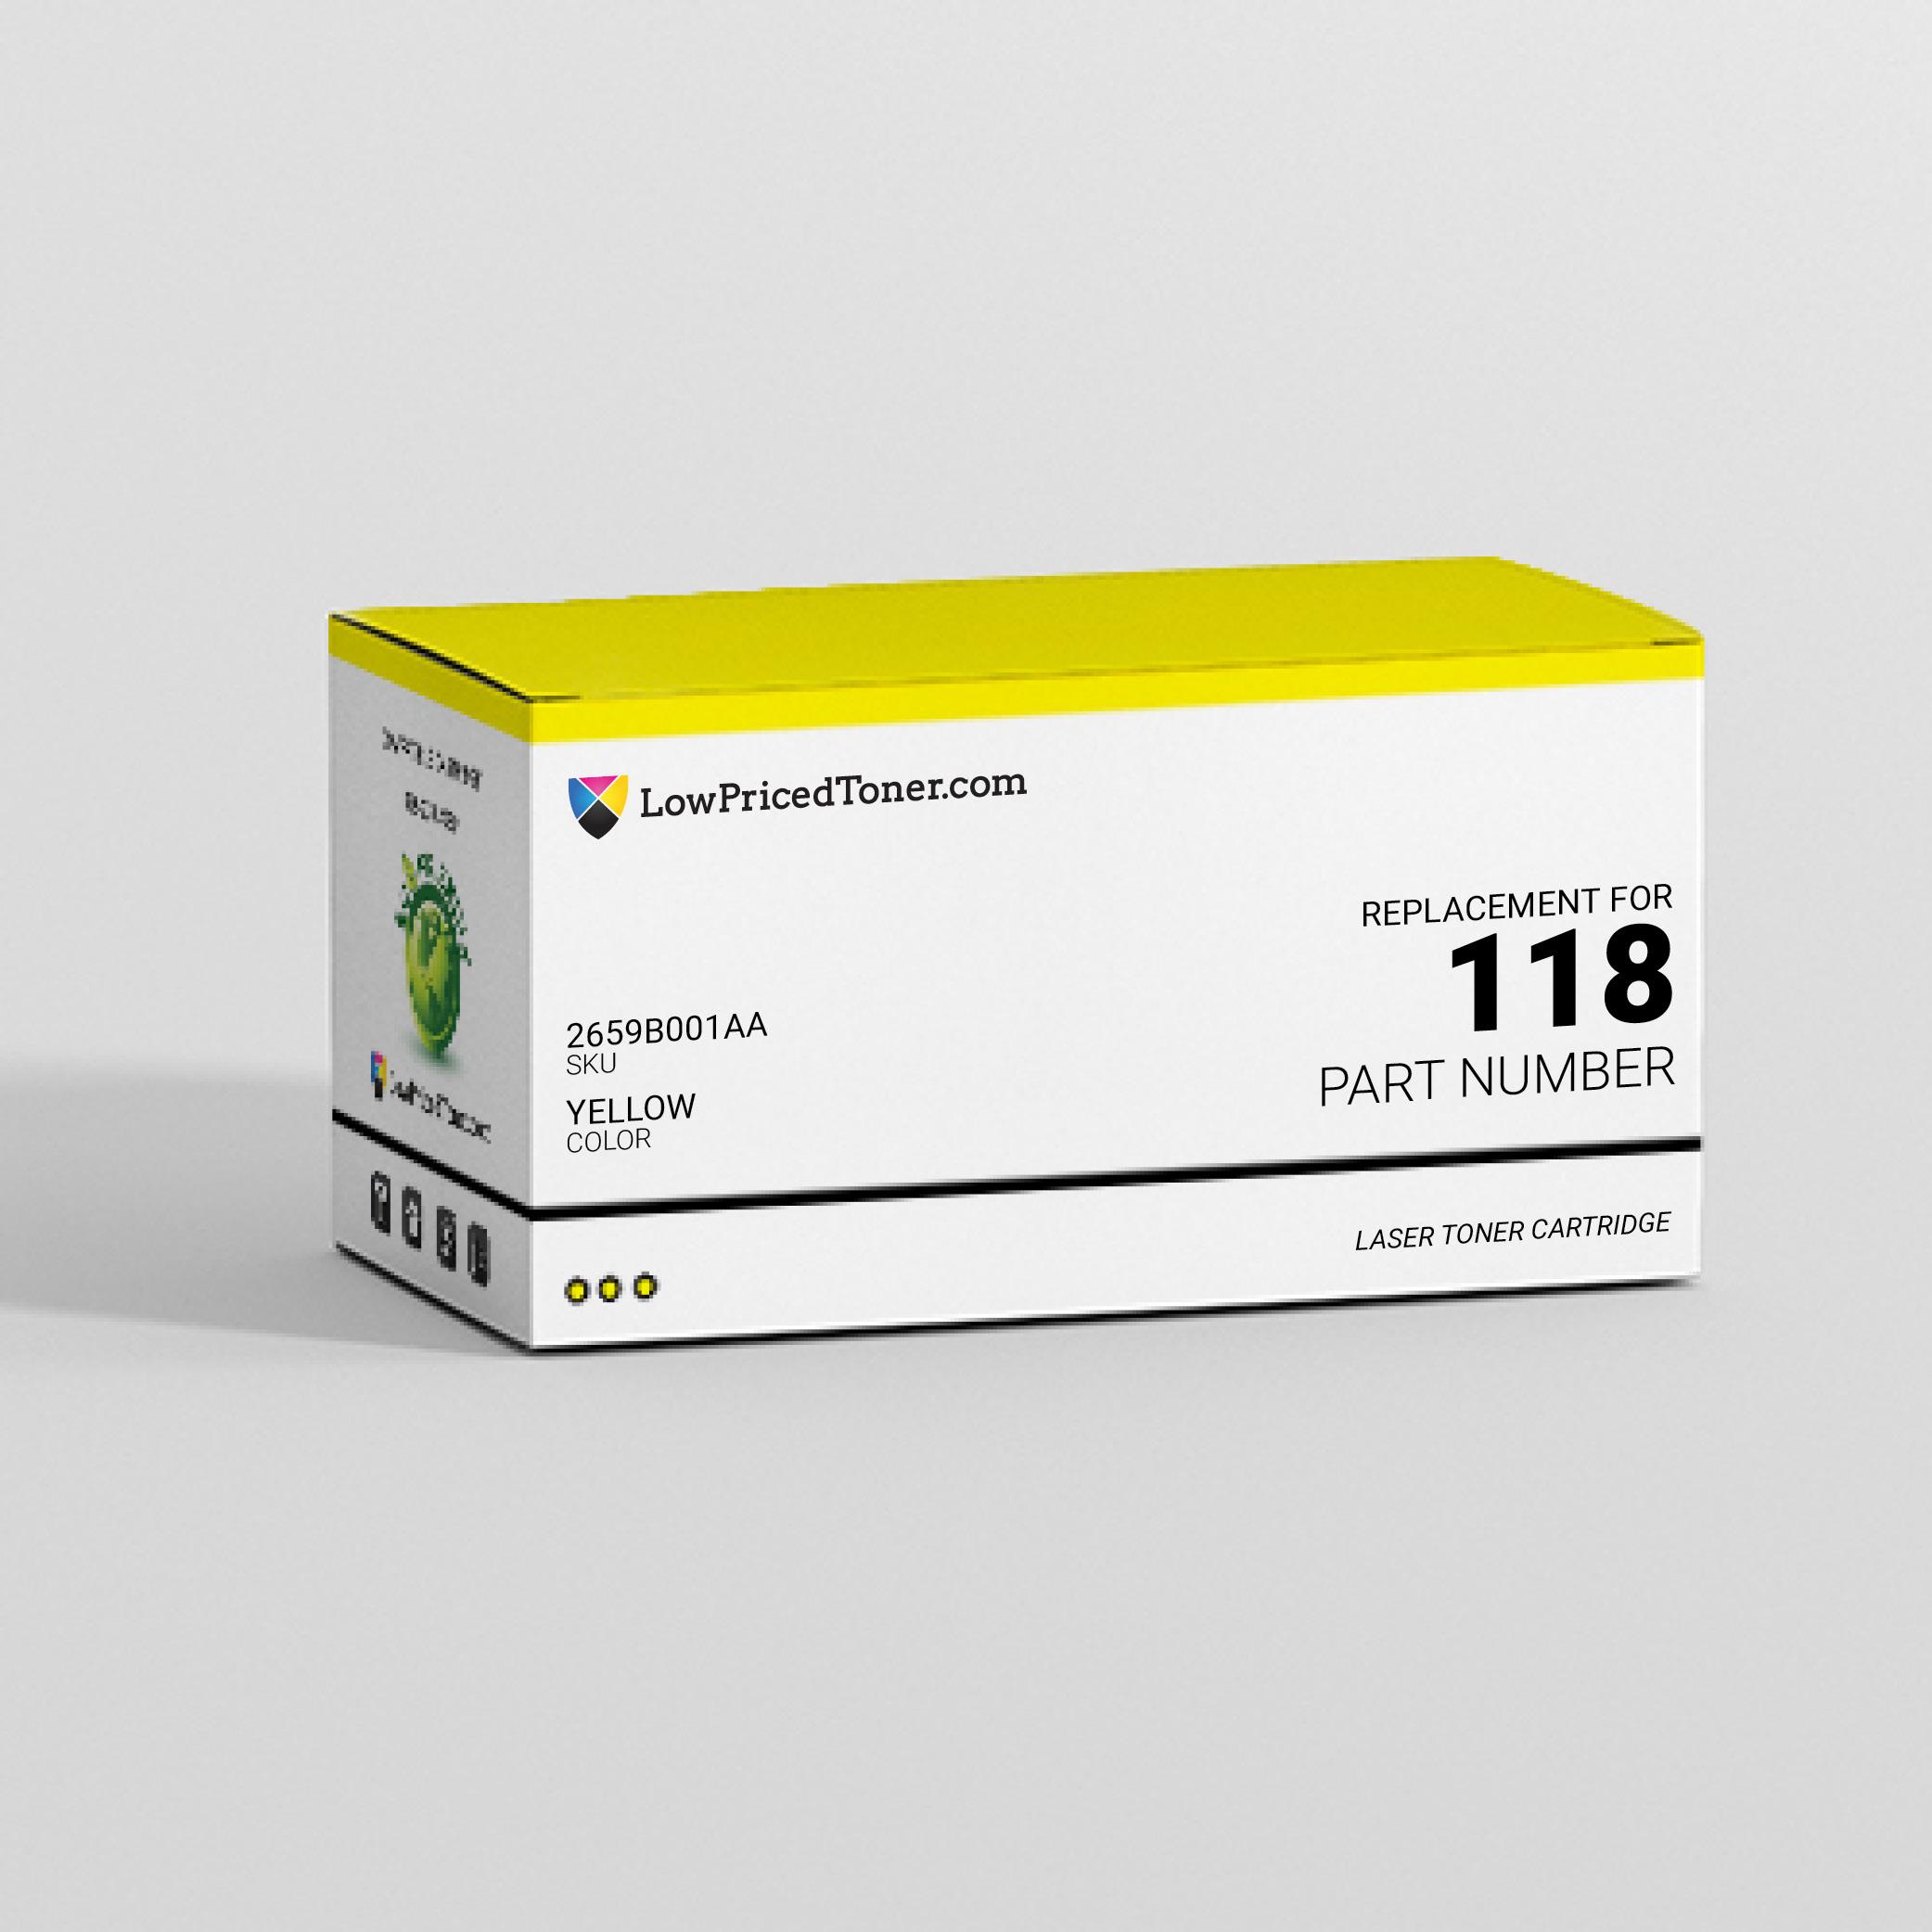 Canon 2659B001AA 118 Compatible Yellow Laser Toner Cartridge